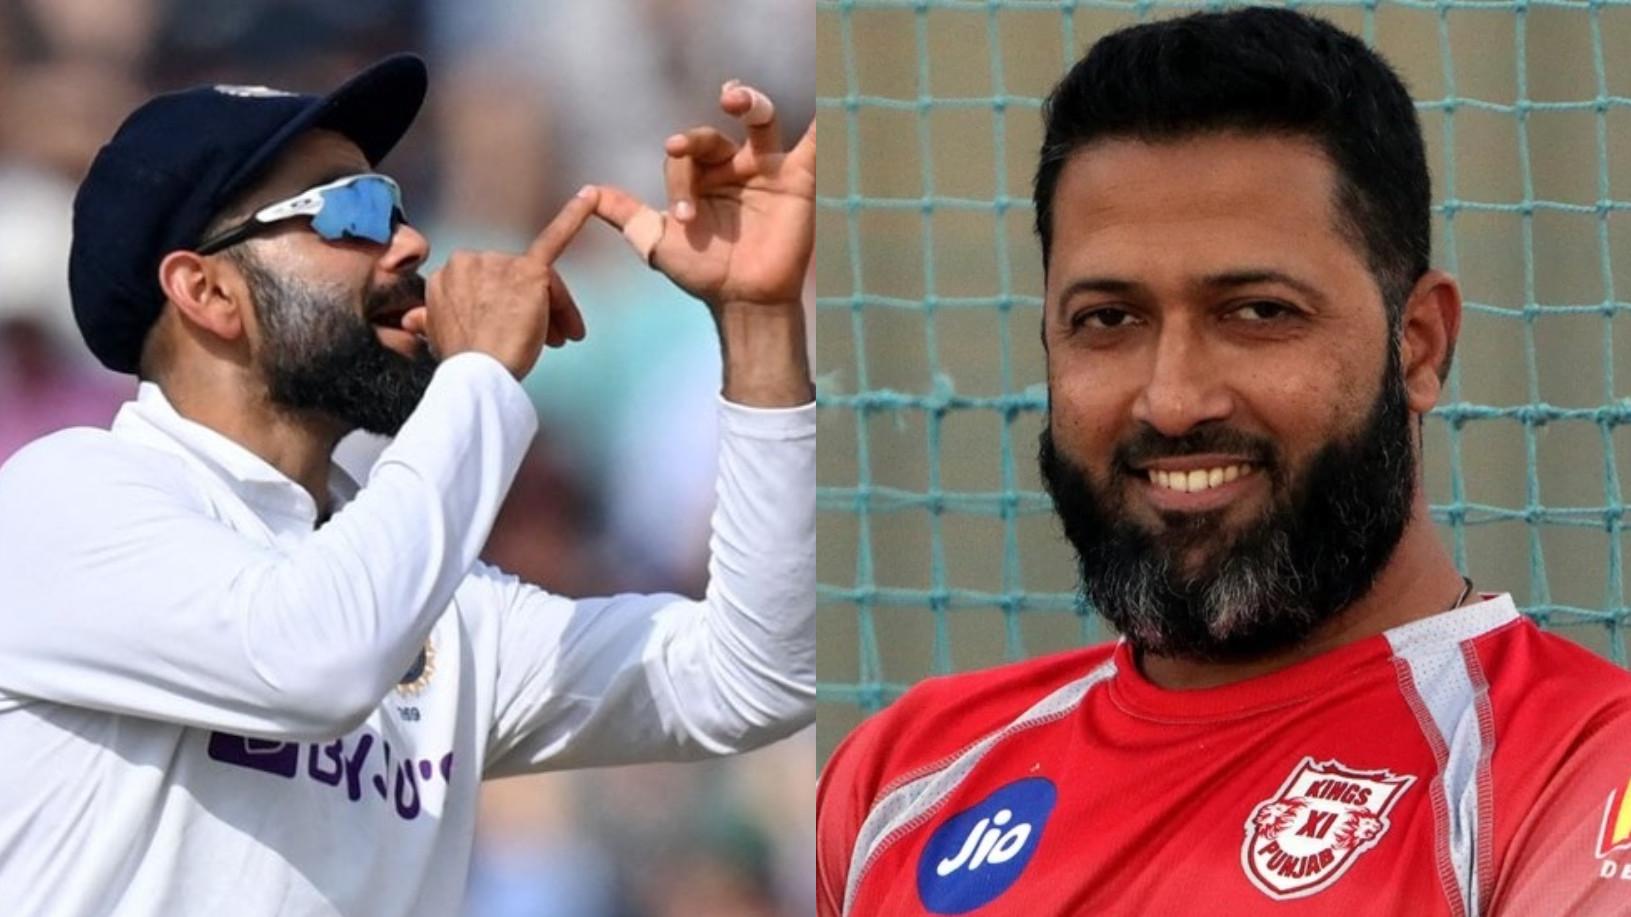 ENG v IND 2021: Wasim Jaffer corrects Fox Cricket's 'classless' caption for Virat Kohli's trumpet gesture